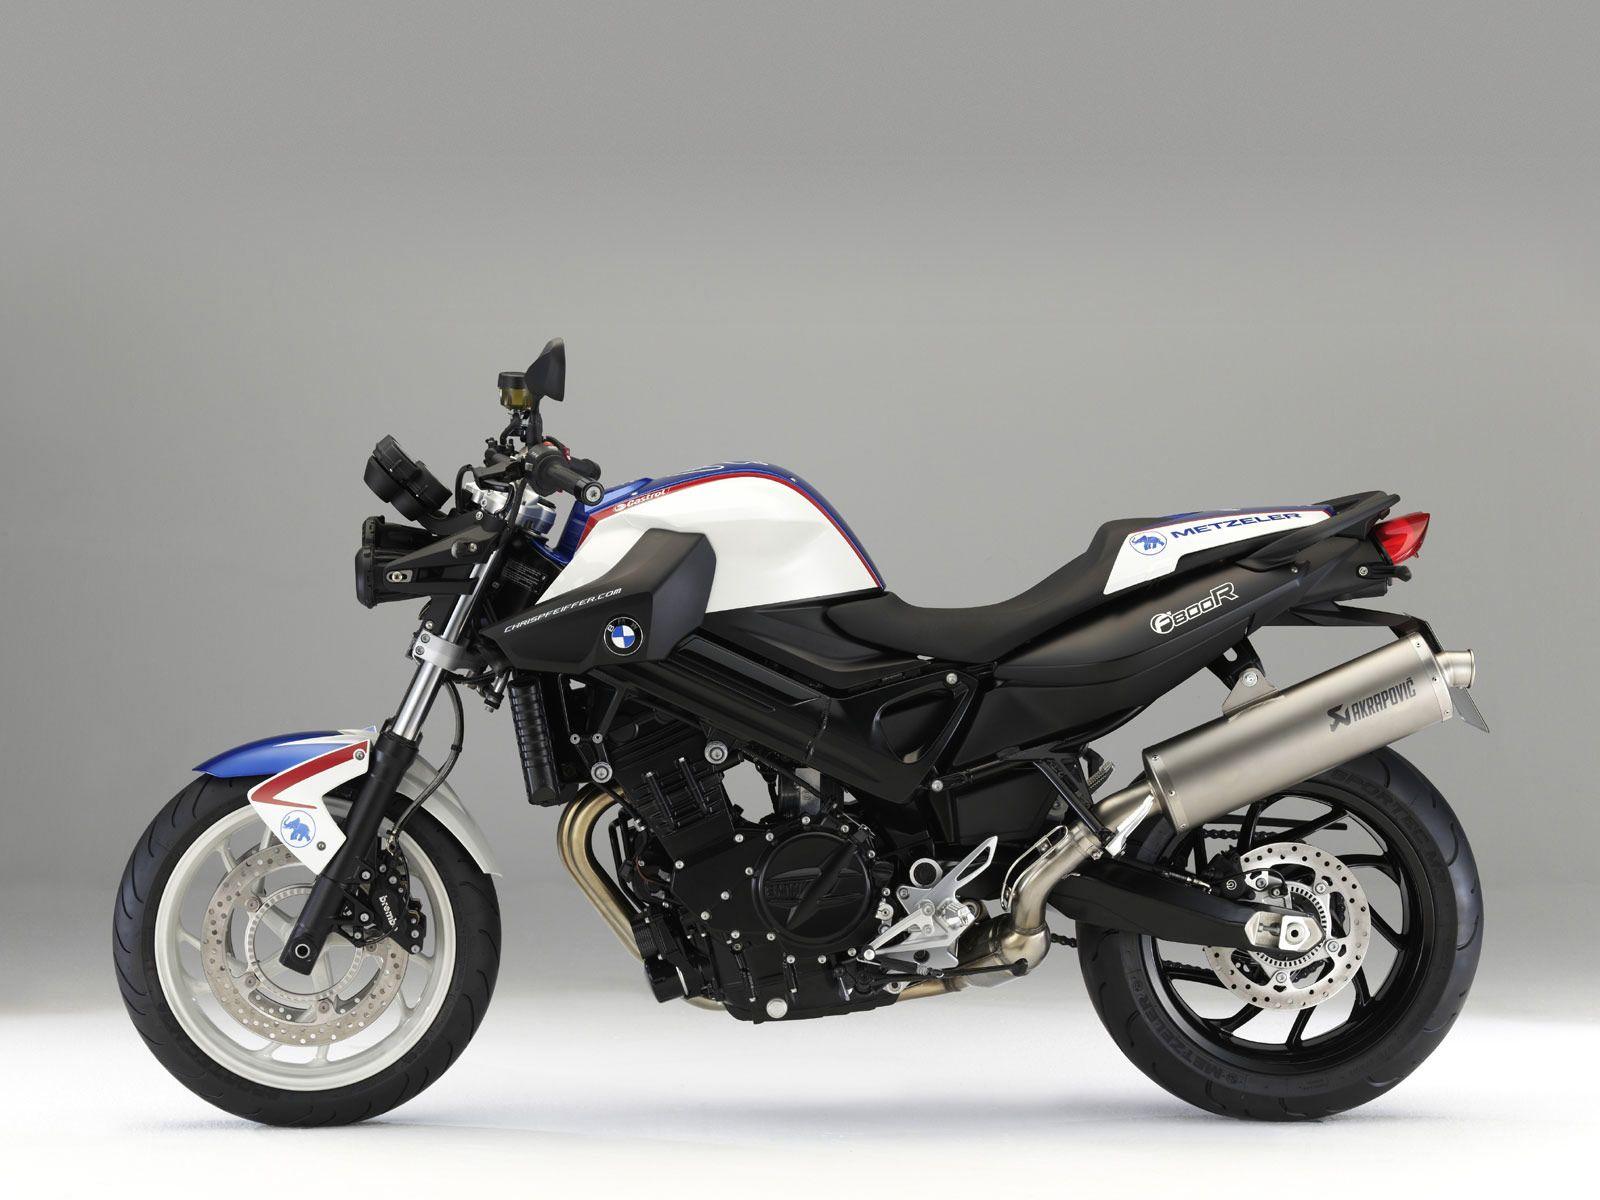 2010 BMW F800R Chris Pfeiffer Edition Motorcycle insurance info